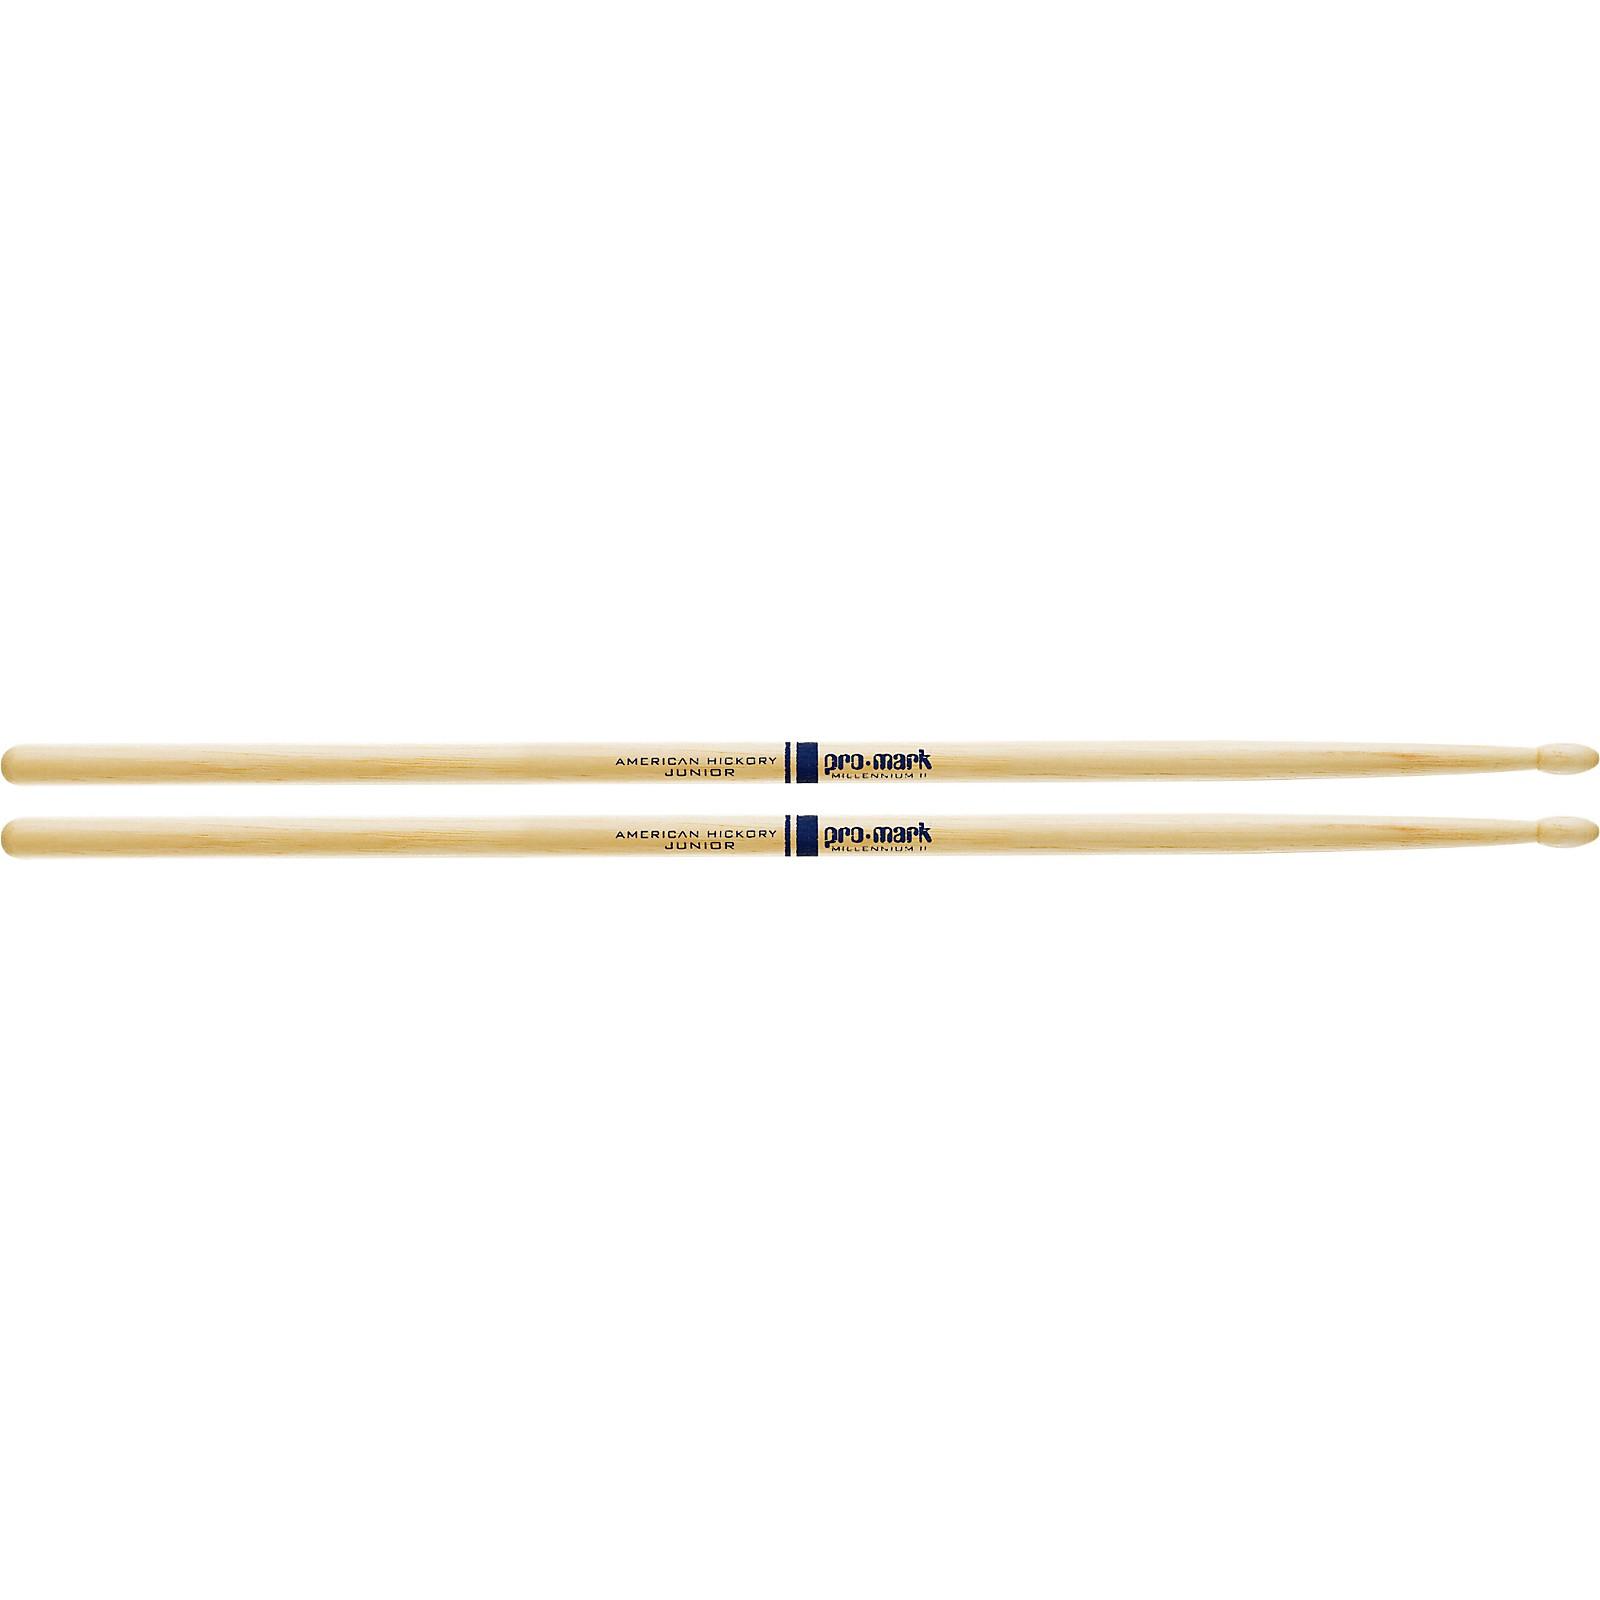 Promark Future Pro Jr. Drumsticks